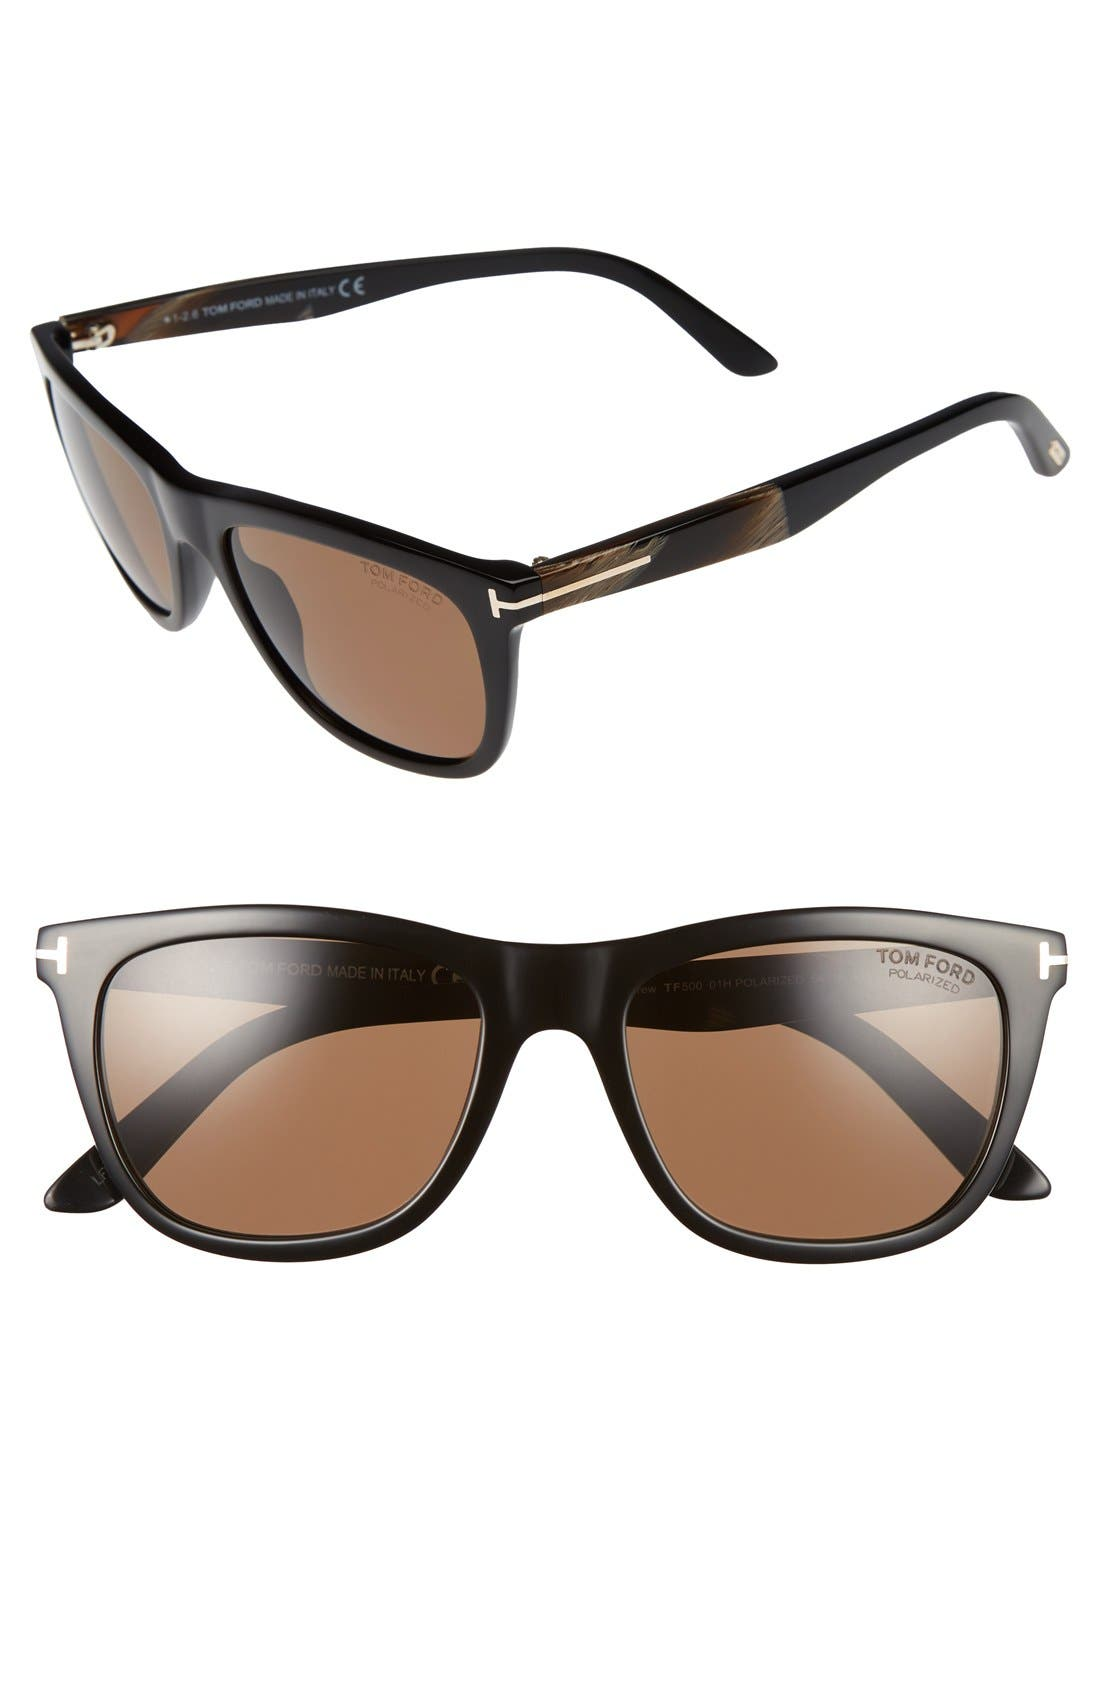 Main Image - Tom Ford Andrew 54mm Sunglasses